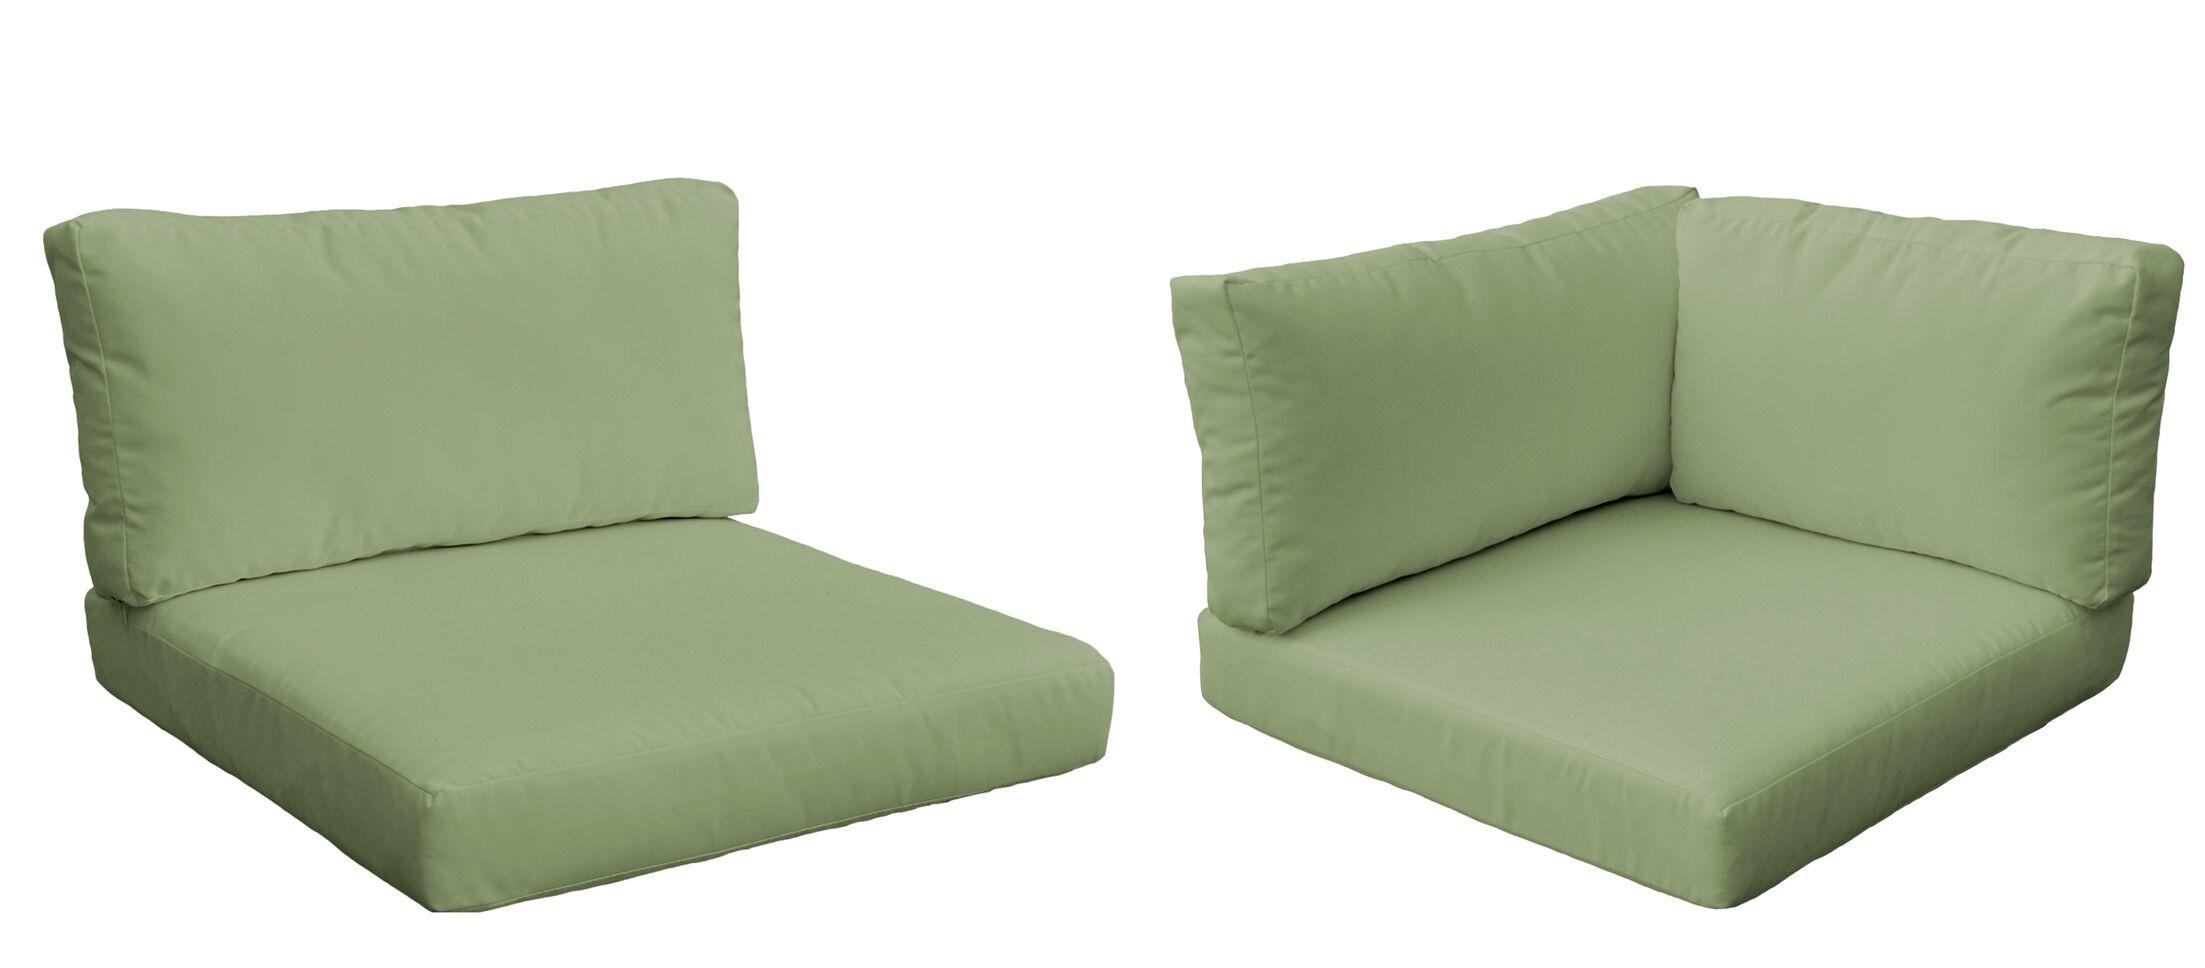 Belle 5 Piece Outdoor Cushion Set Fabric: Cilantro